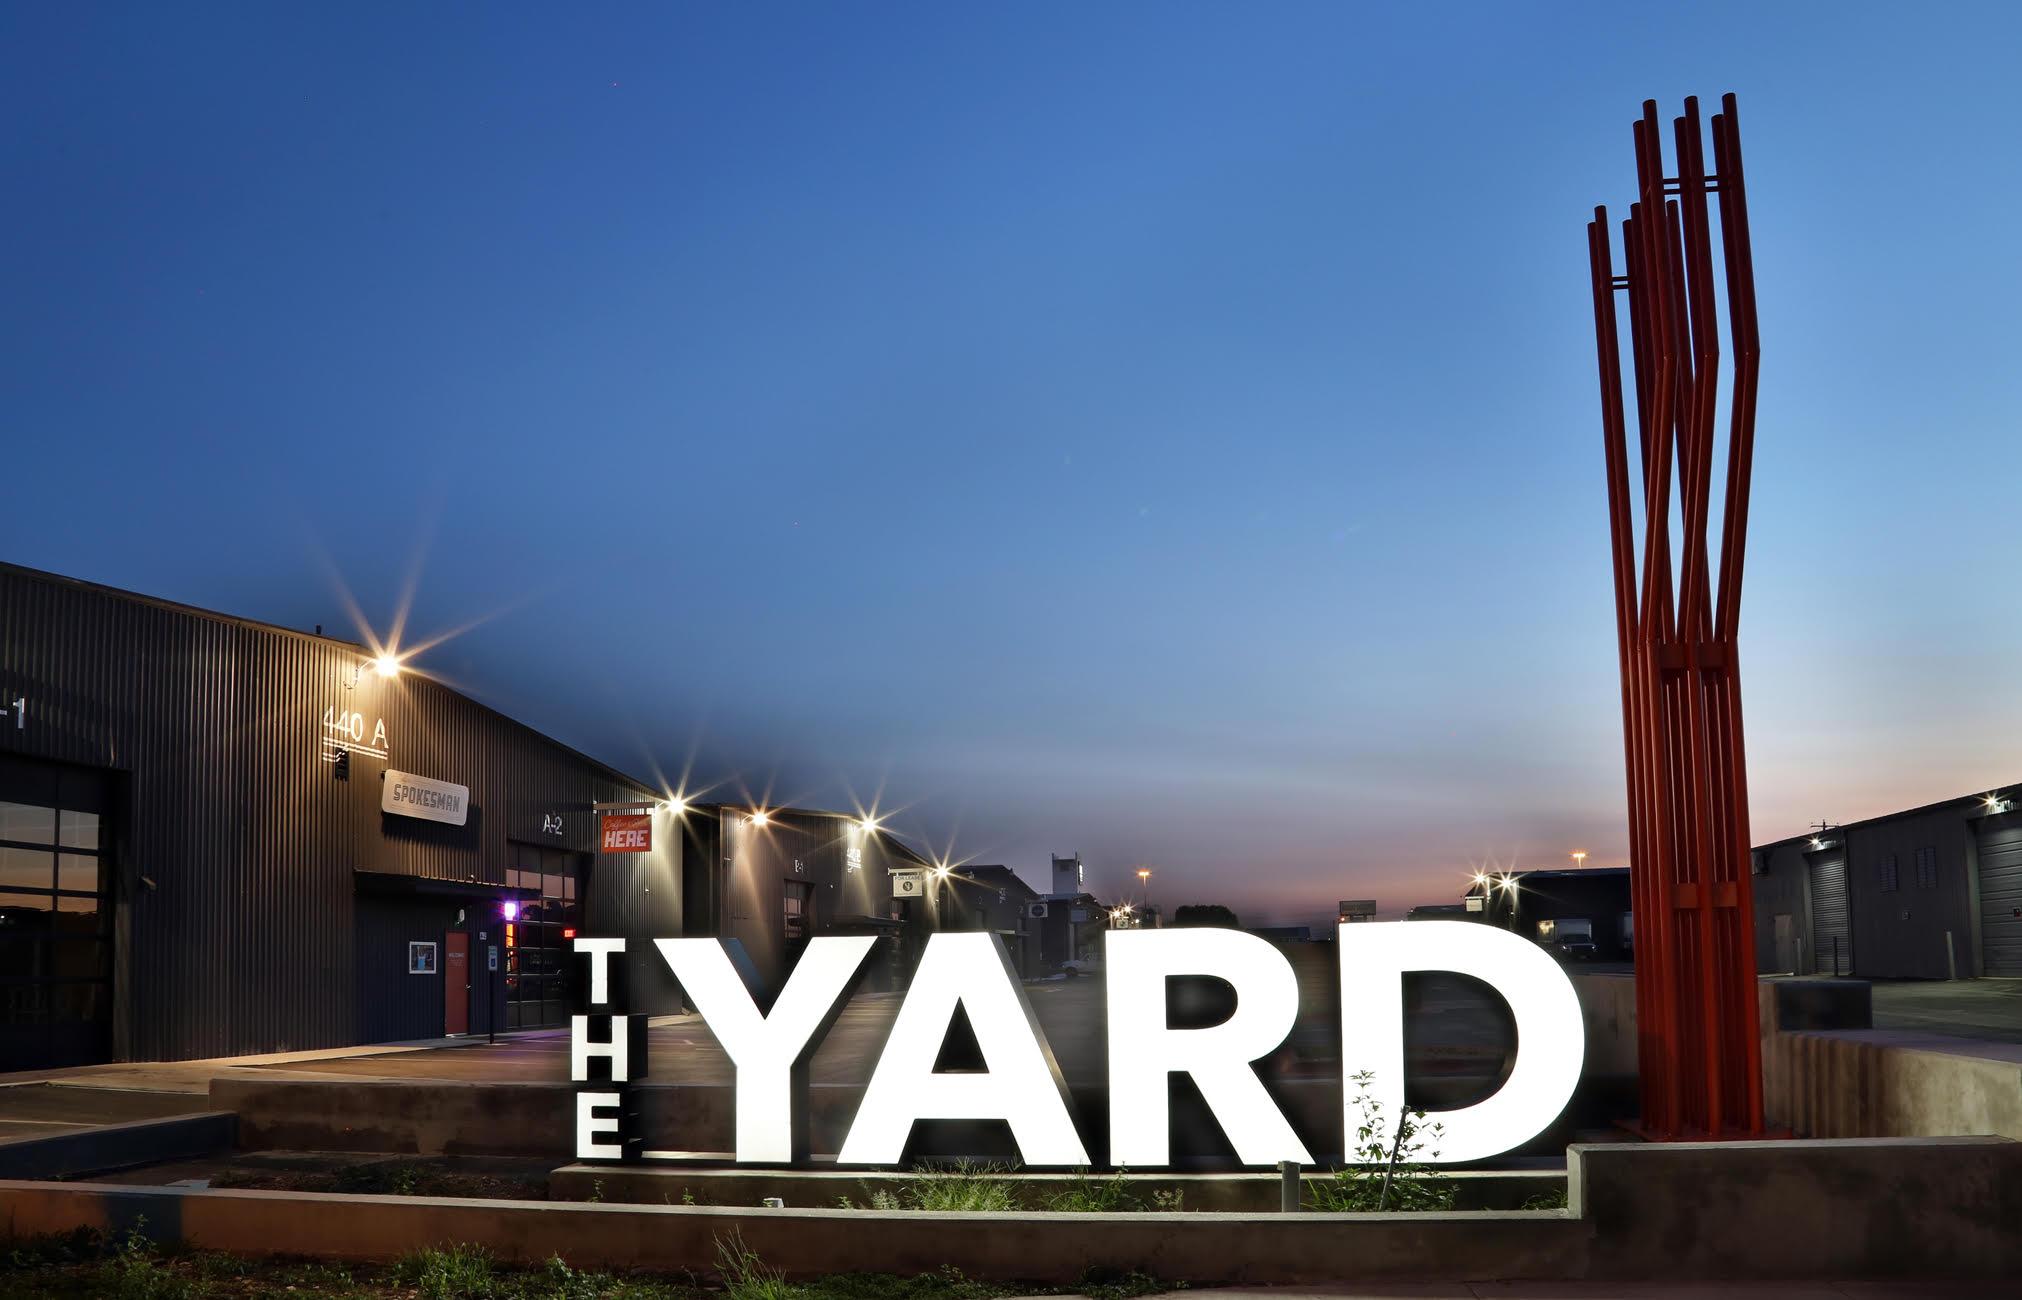 The Yard exterior - Bruce Malone.jpg